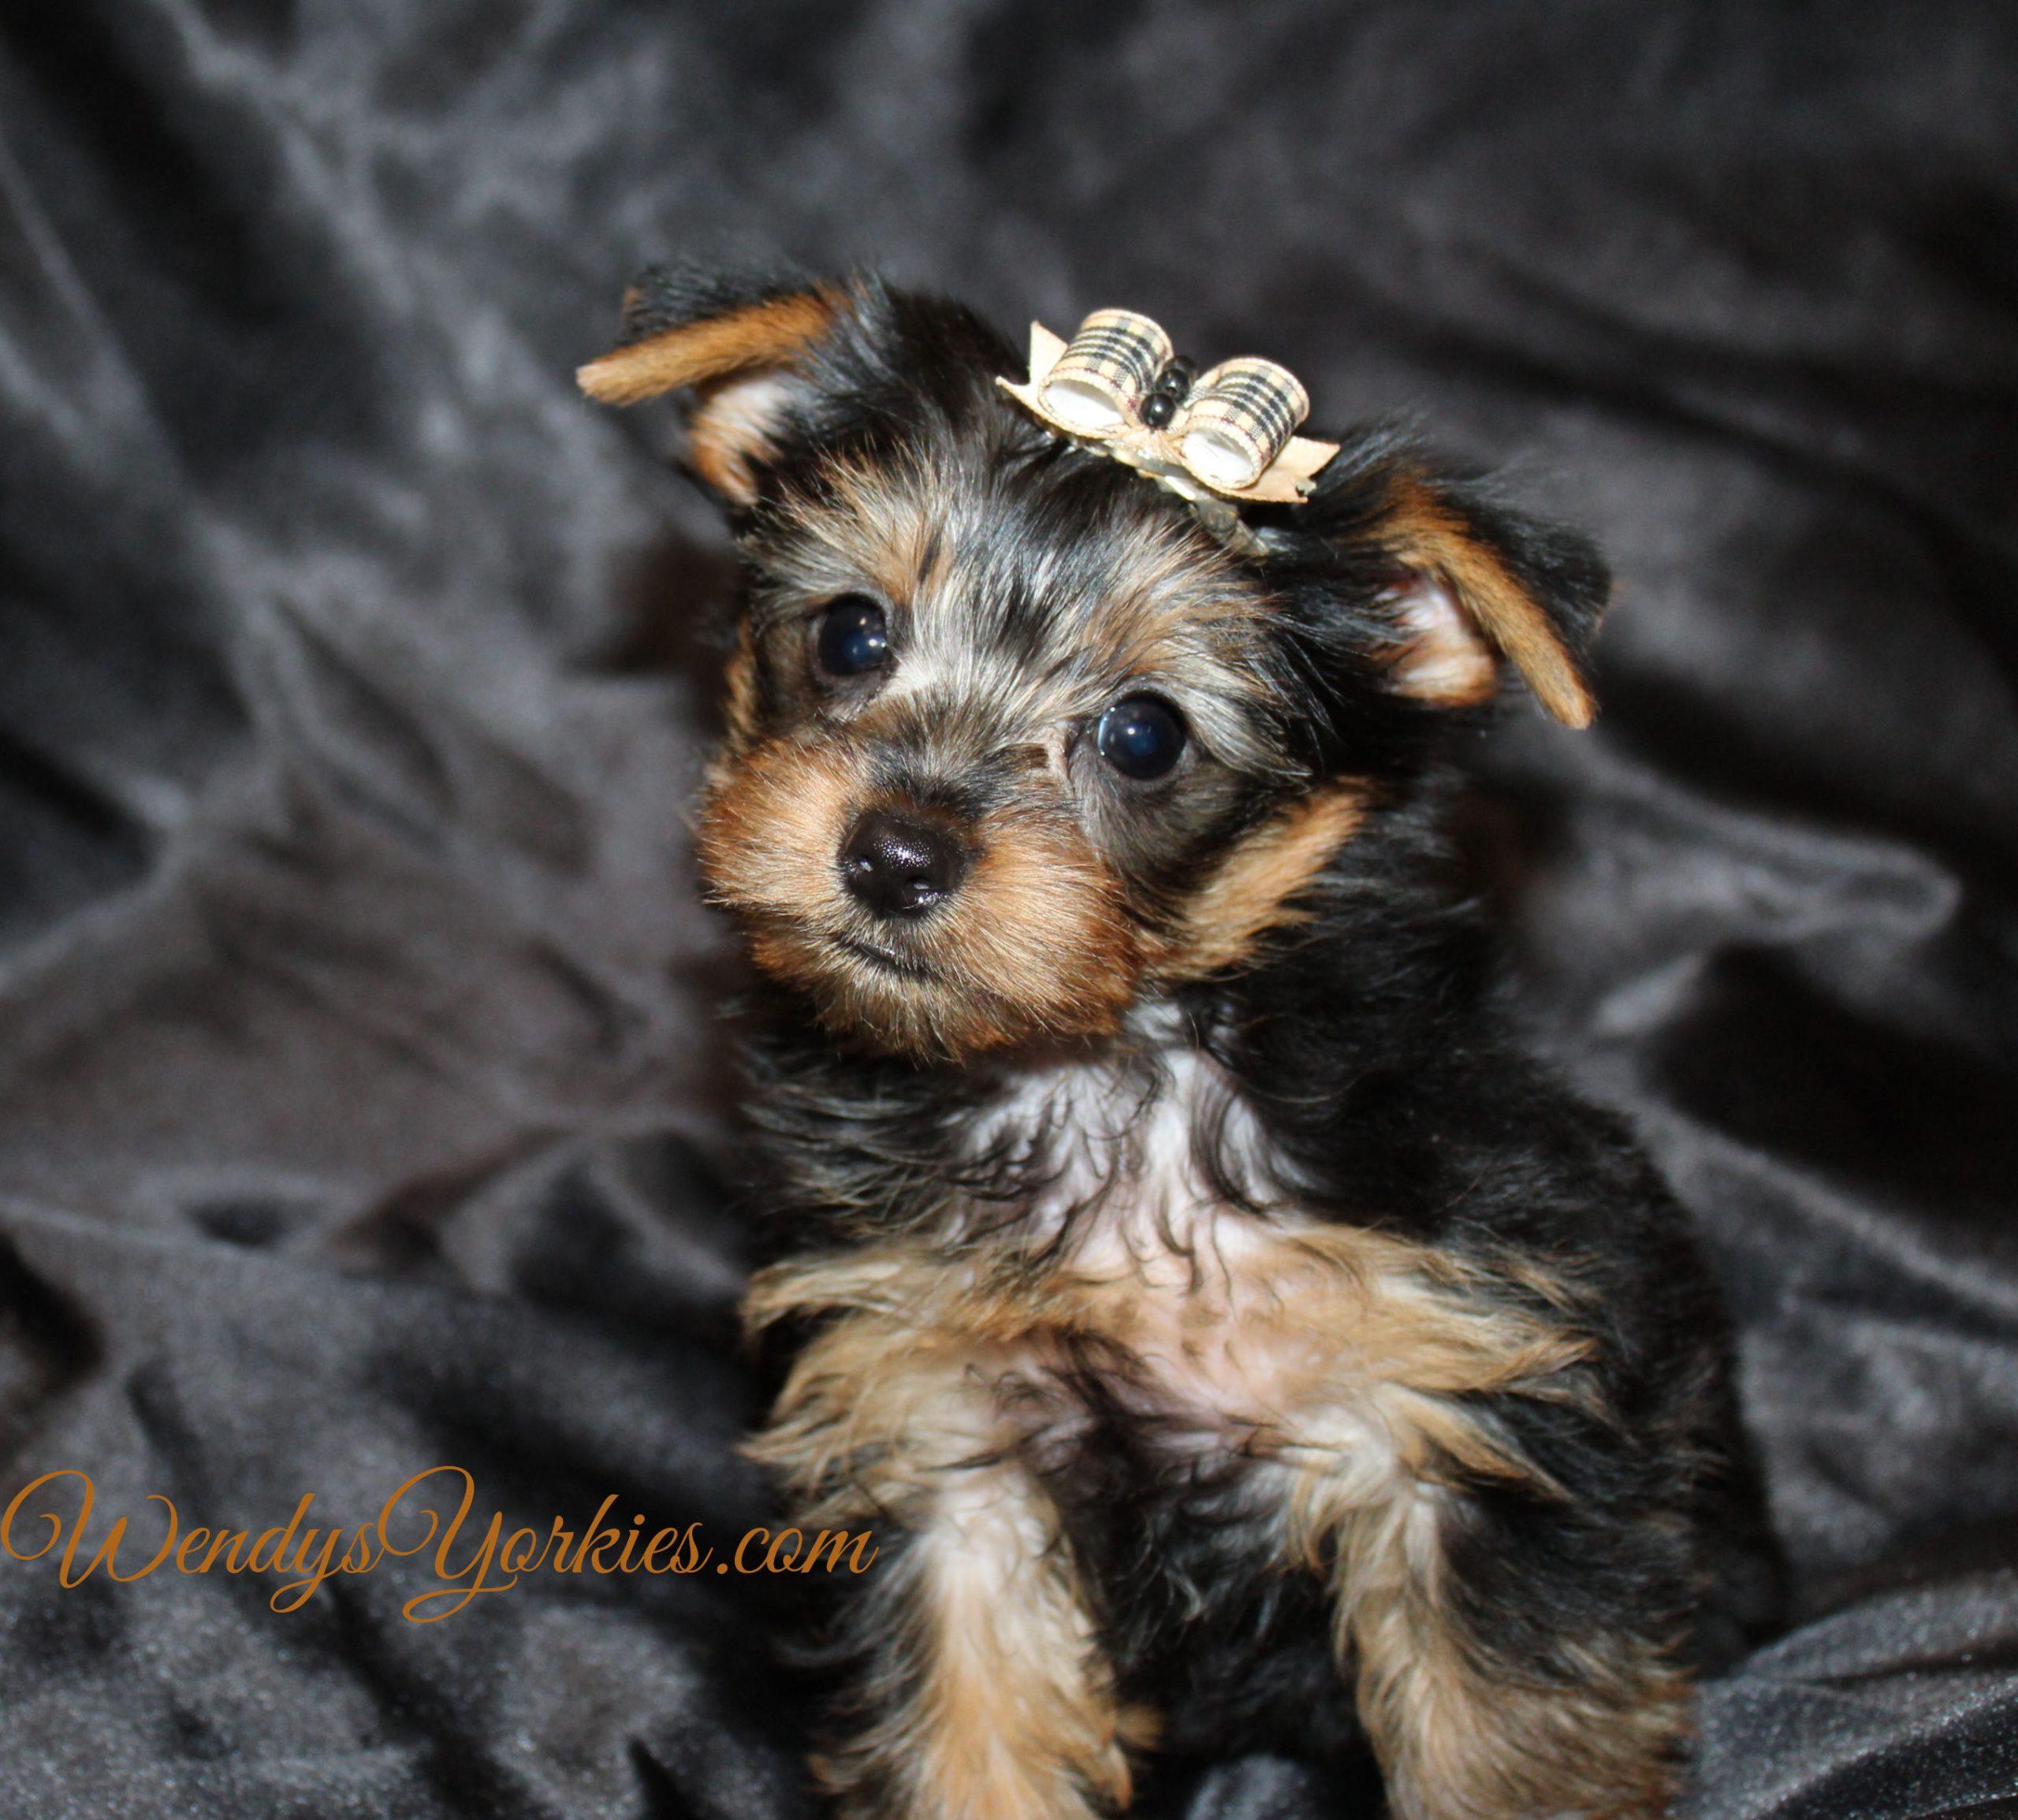 Yorkie puppy for sale in Texas, m1, WendysYorkies.com